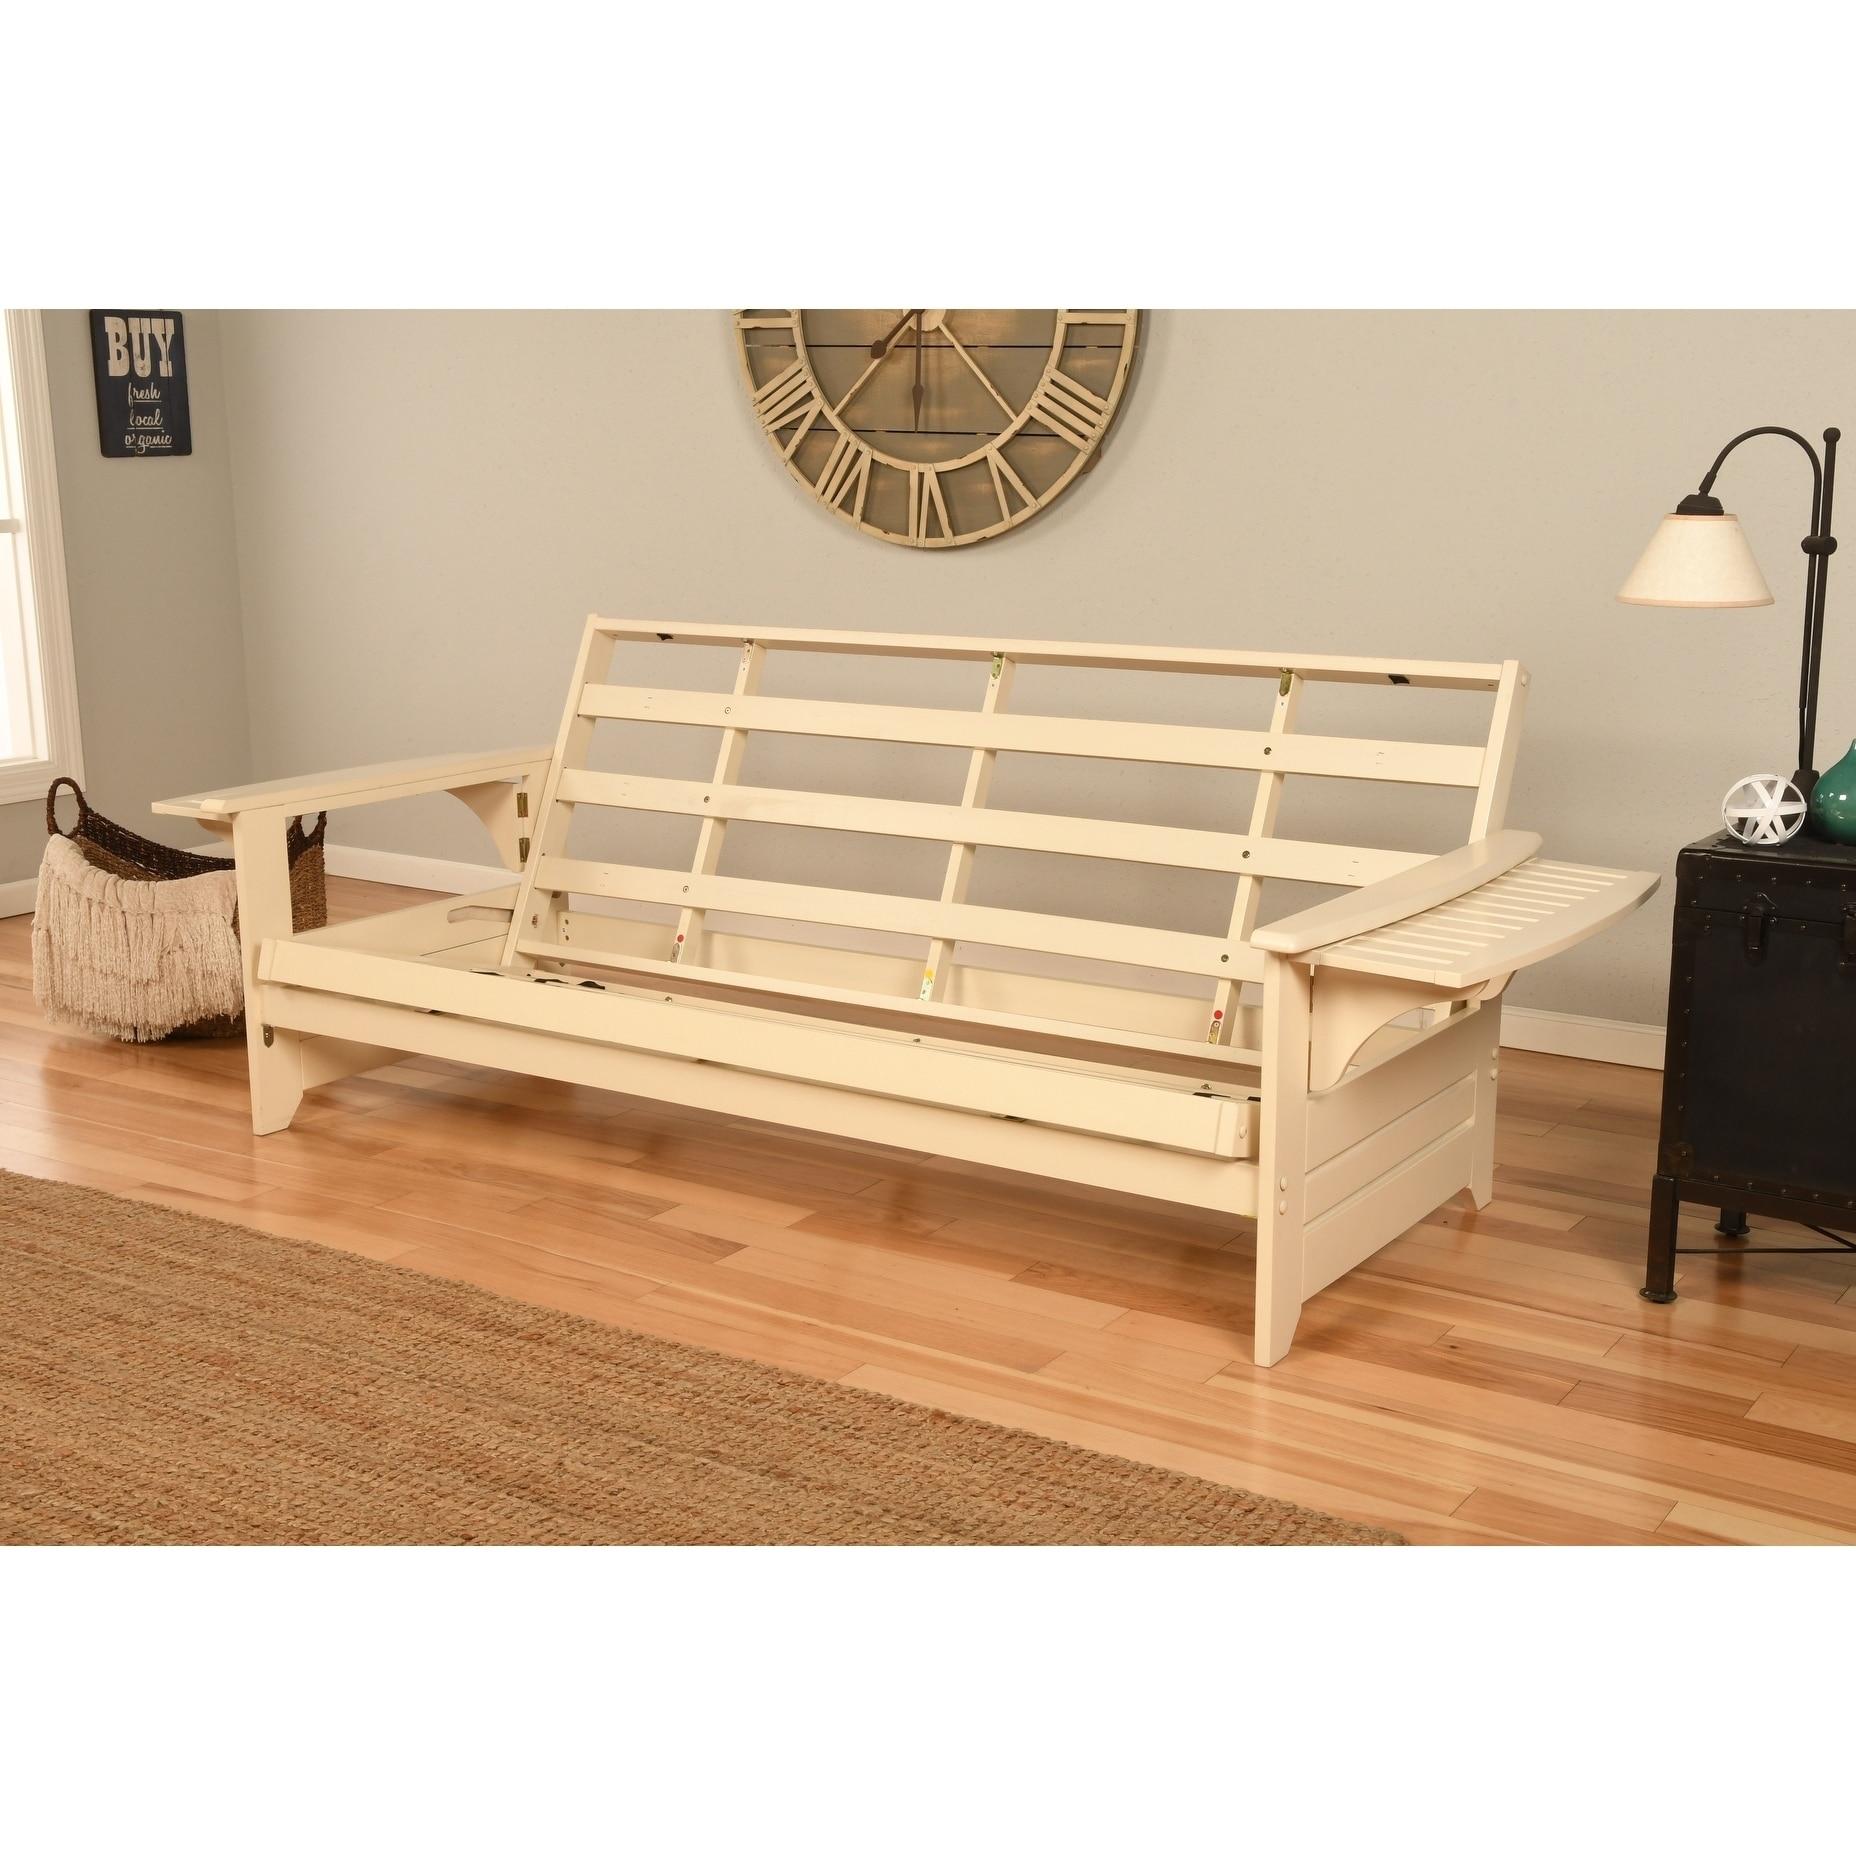 somette ali phonics multi flex futon frame in antique white wood mattress not 609207129929 ebay. Black Bedroom Furniture Sets. Home Design Ideas